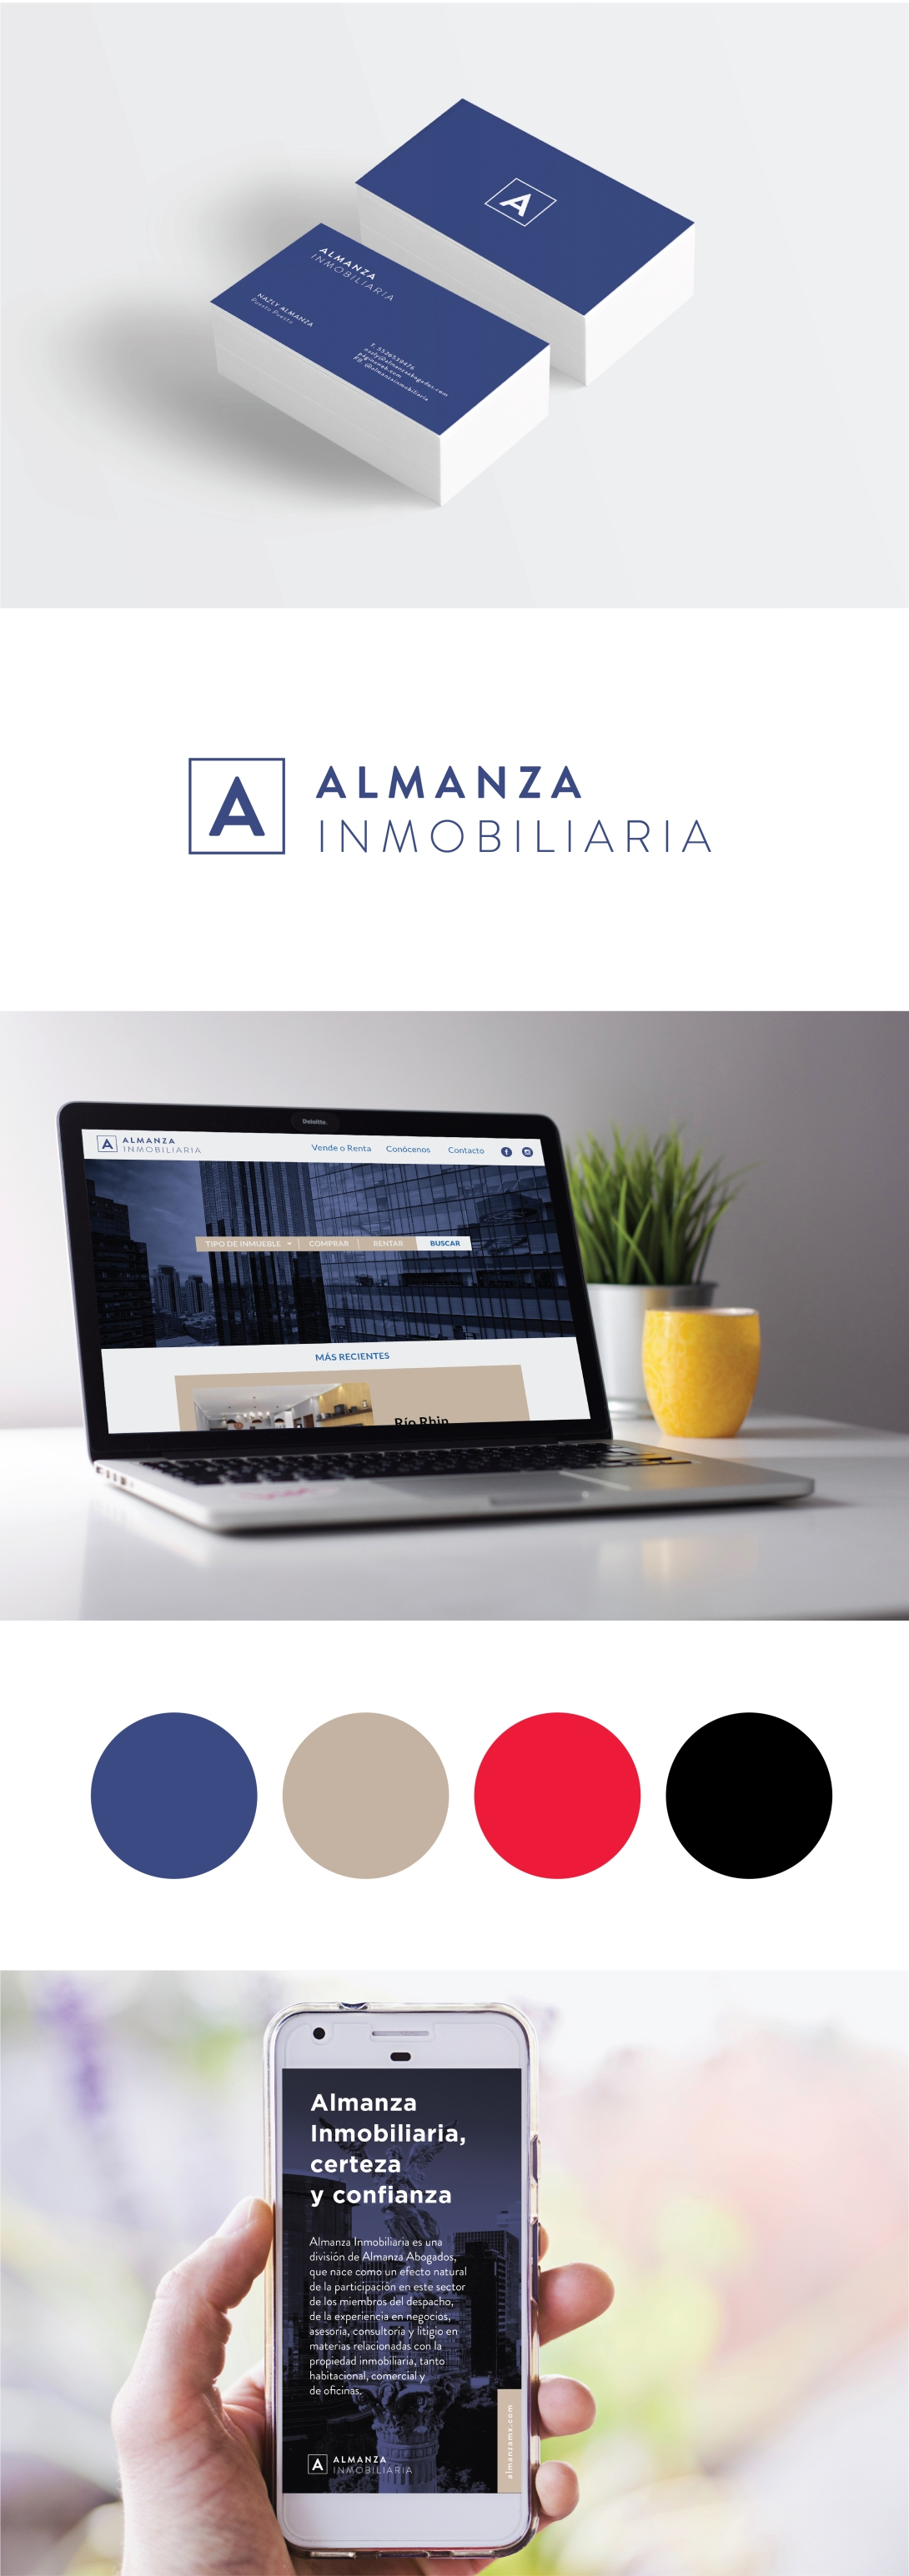 ALMANZA INMOBILIARIA-presentacion-03